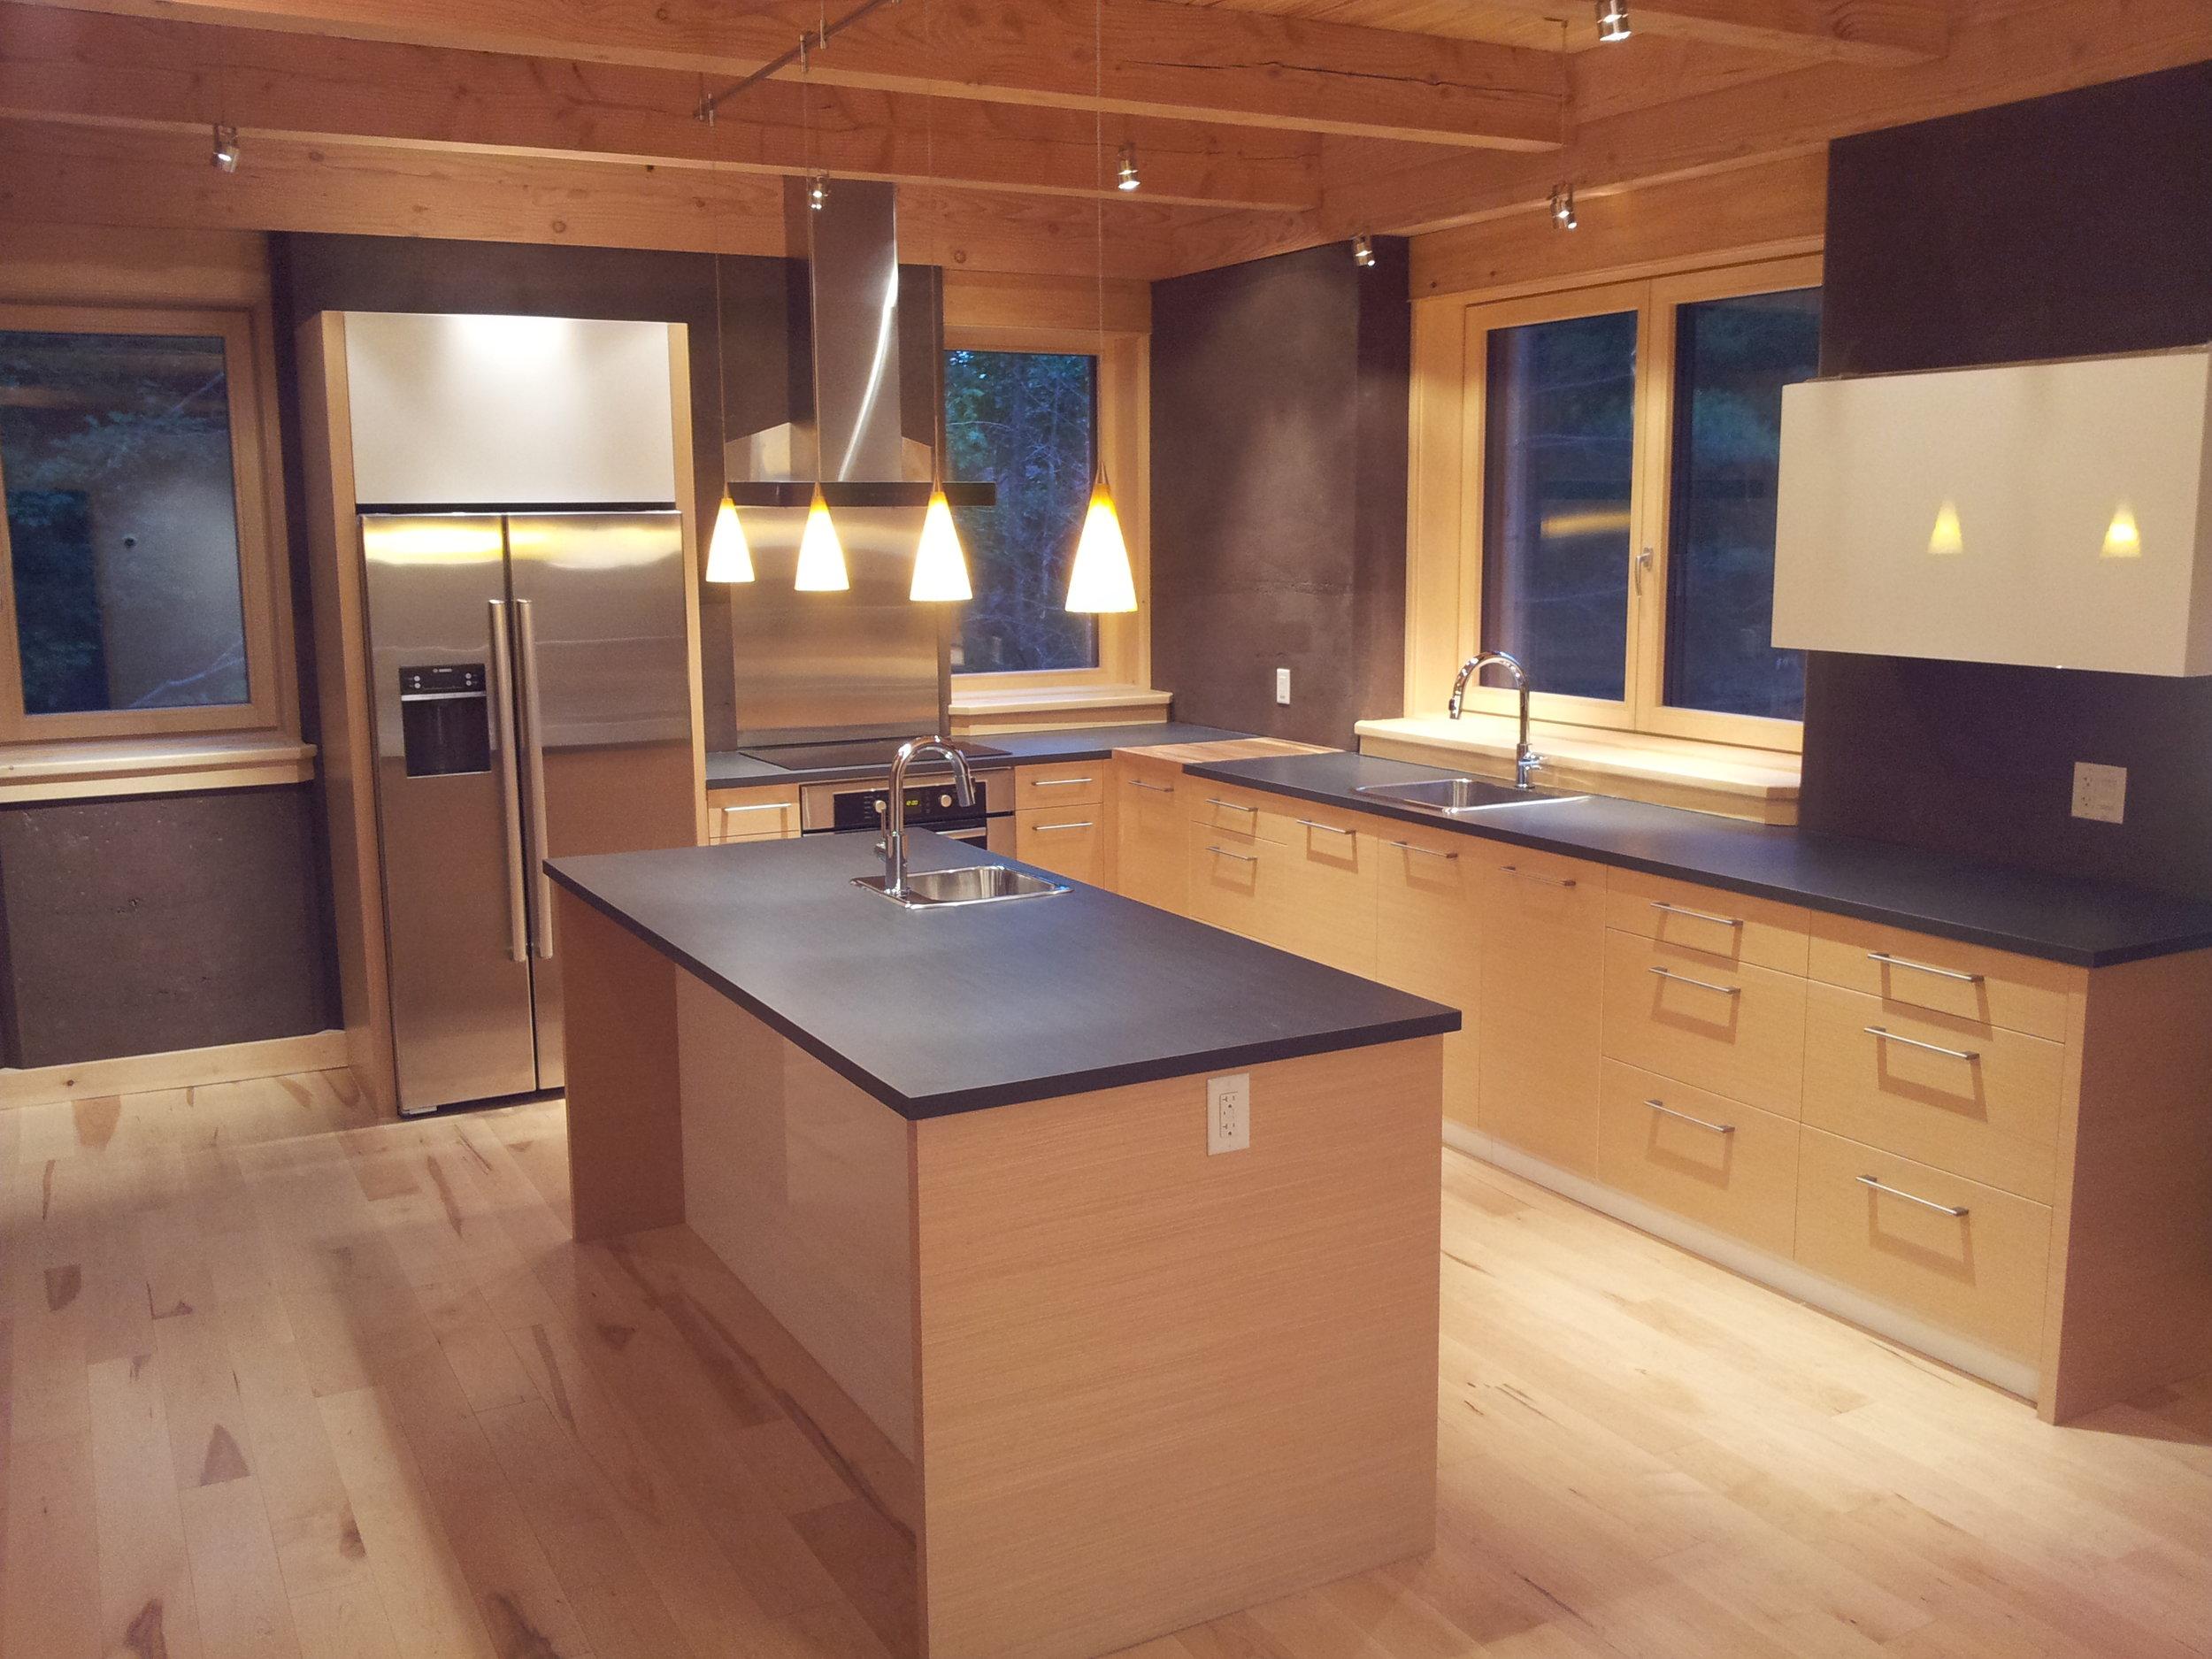 Rammed Earth House Kitchen.jpg